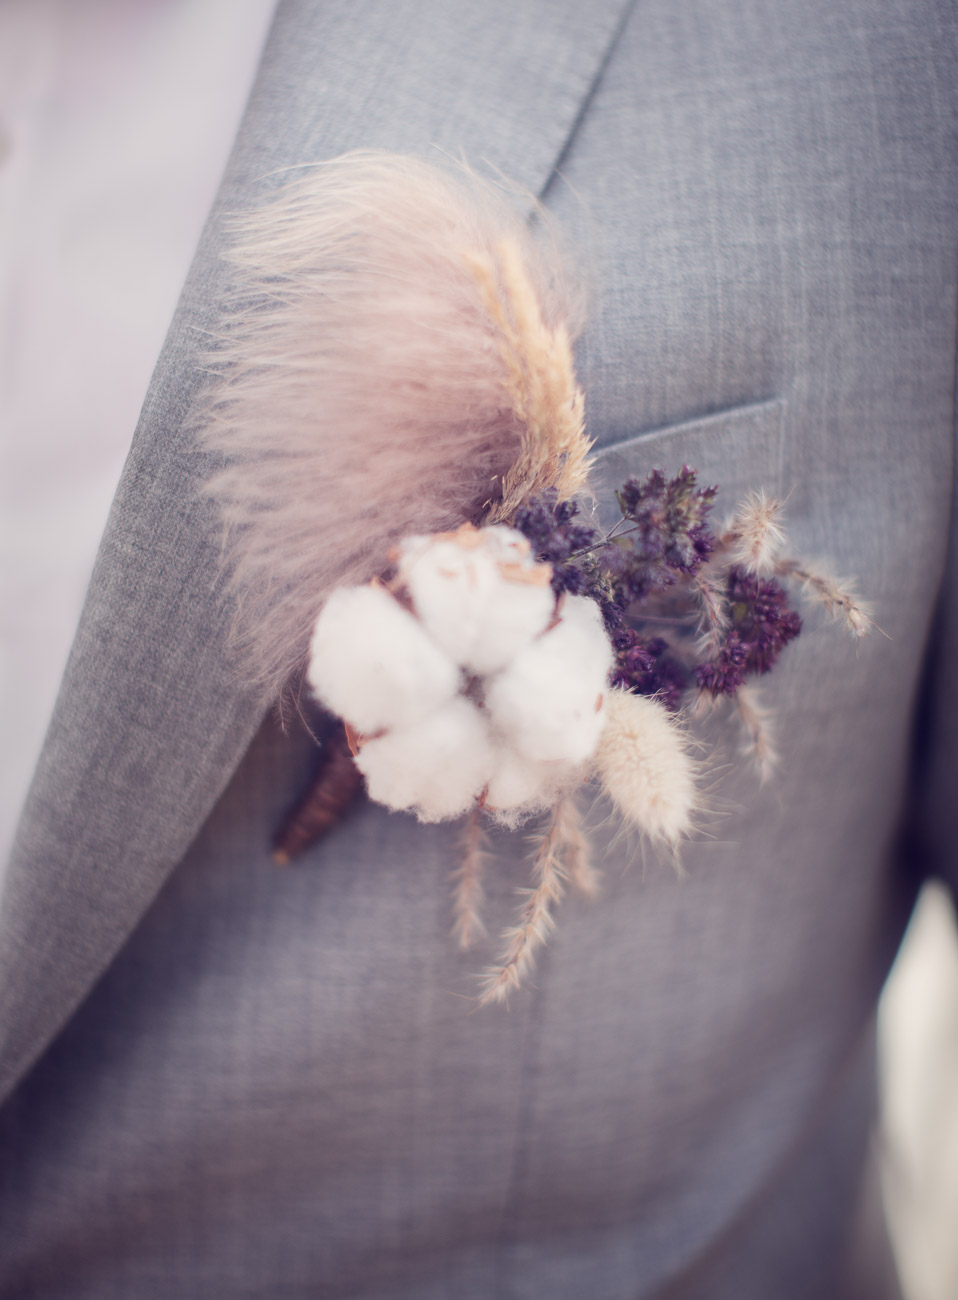 Höstkänsla på Korsage på brudgum